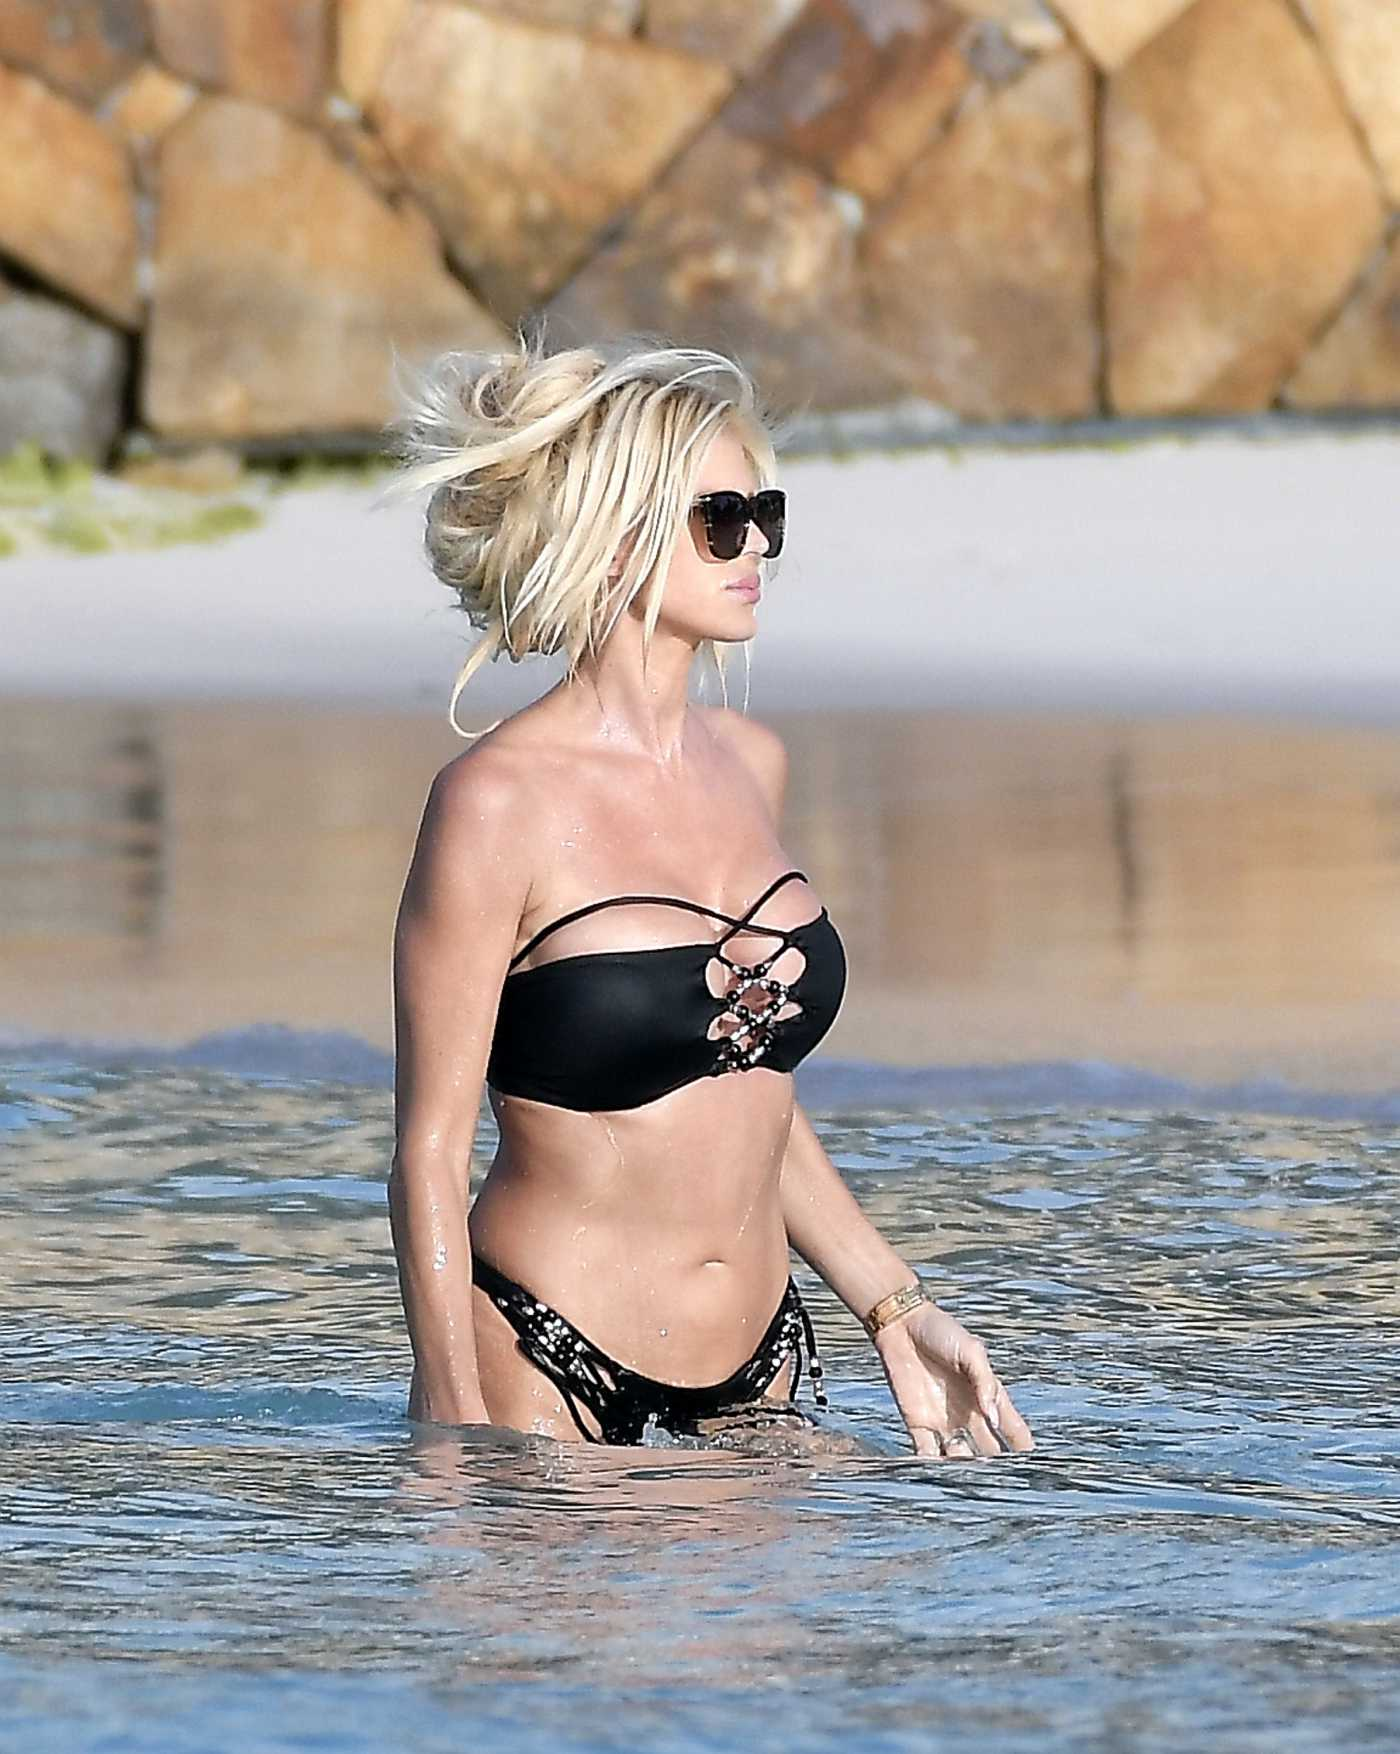 Victoria Silvstedt in a Black Bikini on the Beach in St Barths 01/09/2020